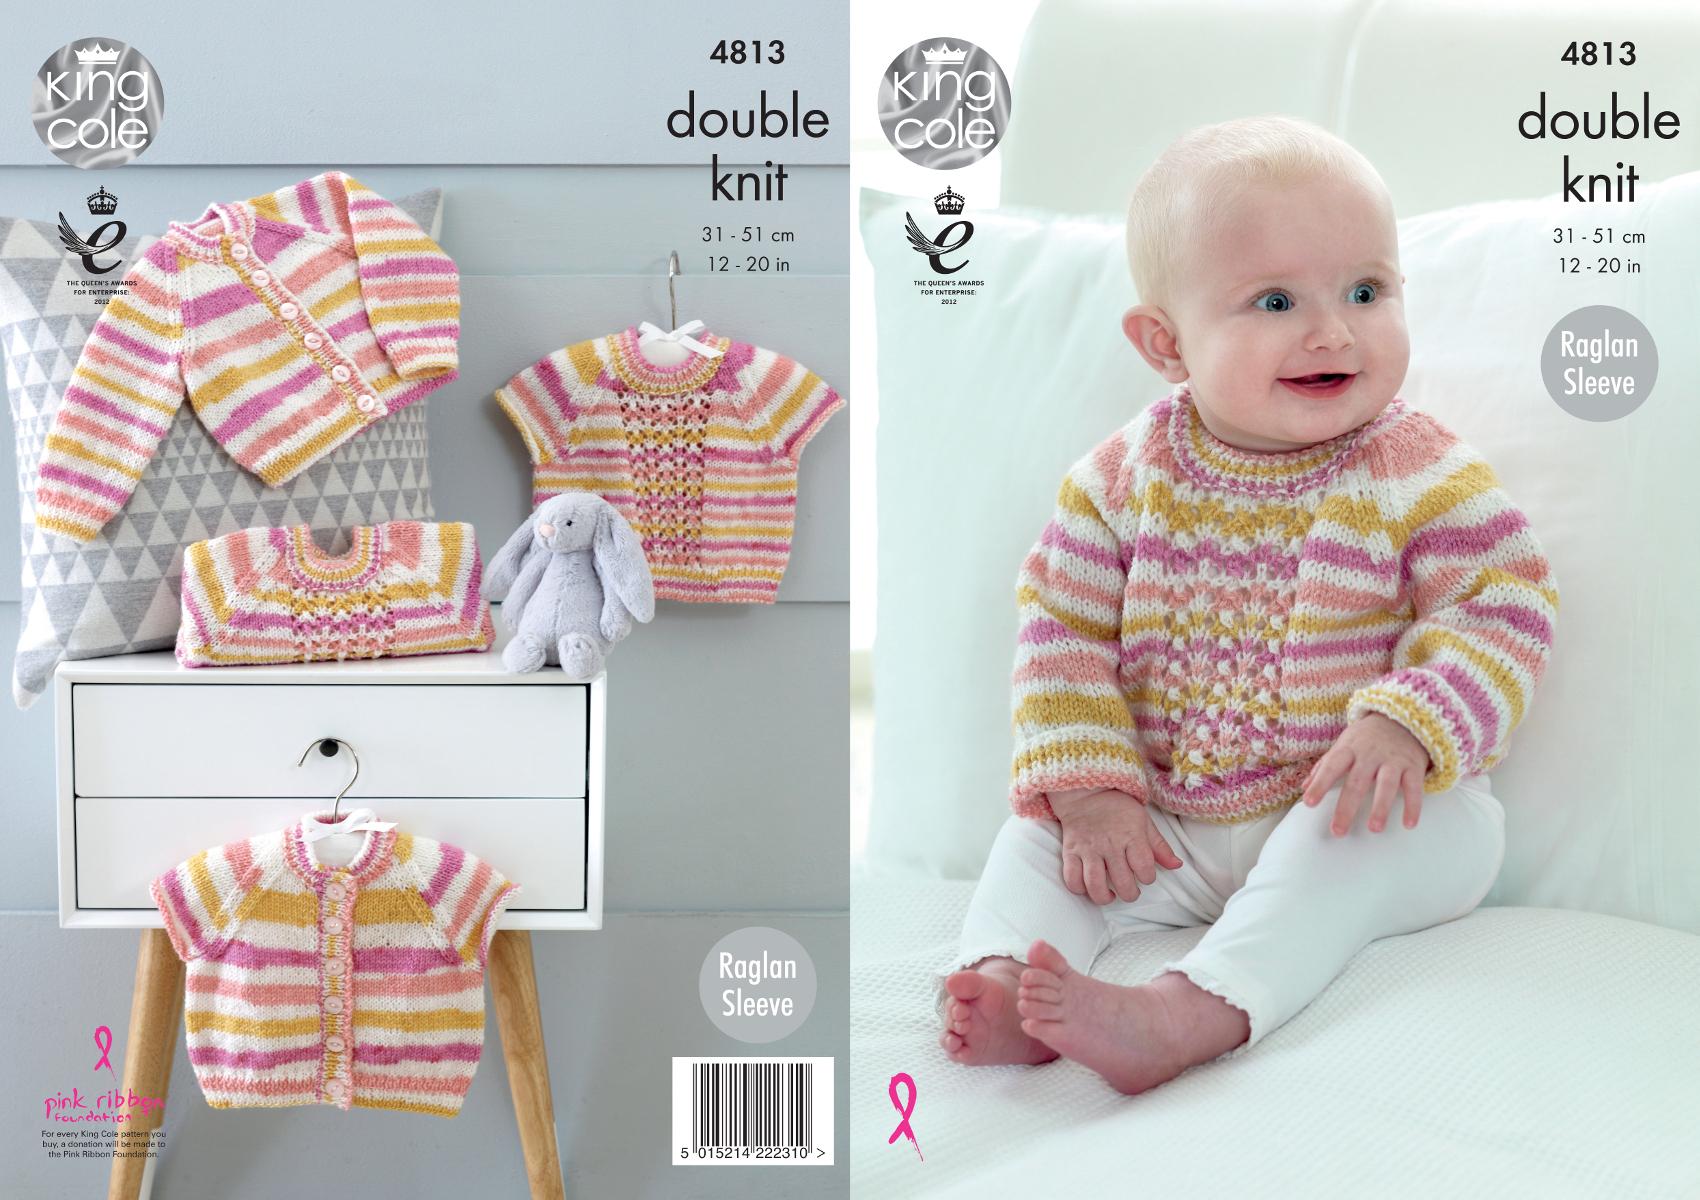 Baby double knitting pattern raglan sleeve cardigans sweaters king baby double knitting pattern raglan sleeve cardigans sweaters king cole dk 4813 bankloansurffo Choice Image